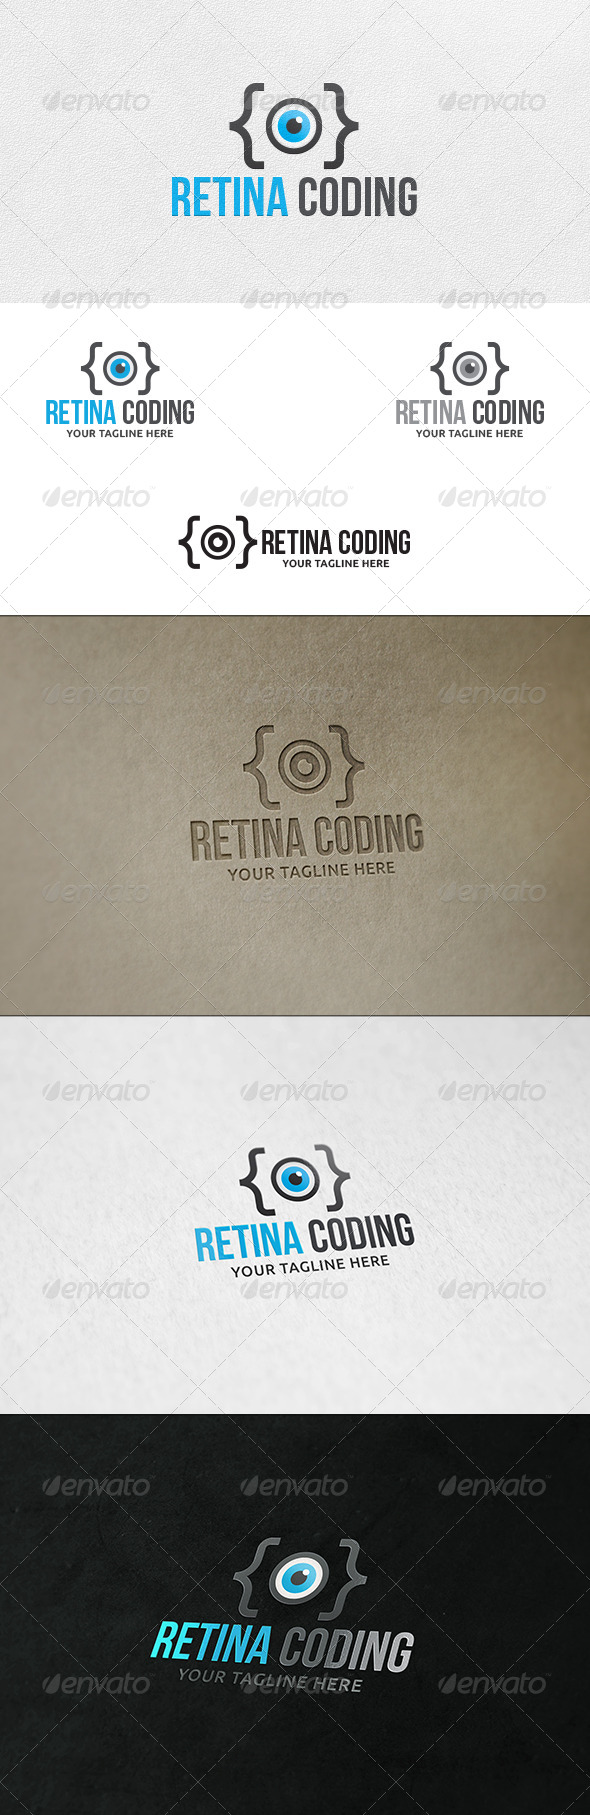 GraphicRiver Retina Coding Logo Template 6642159